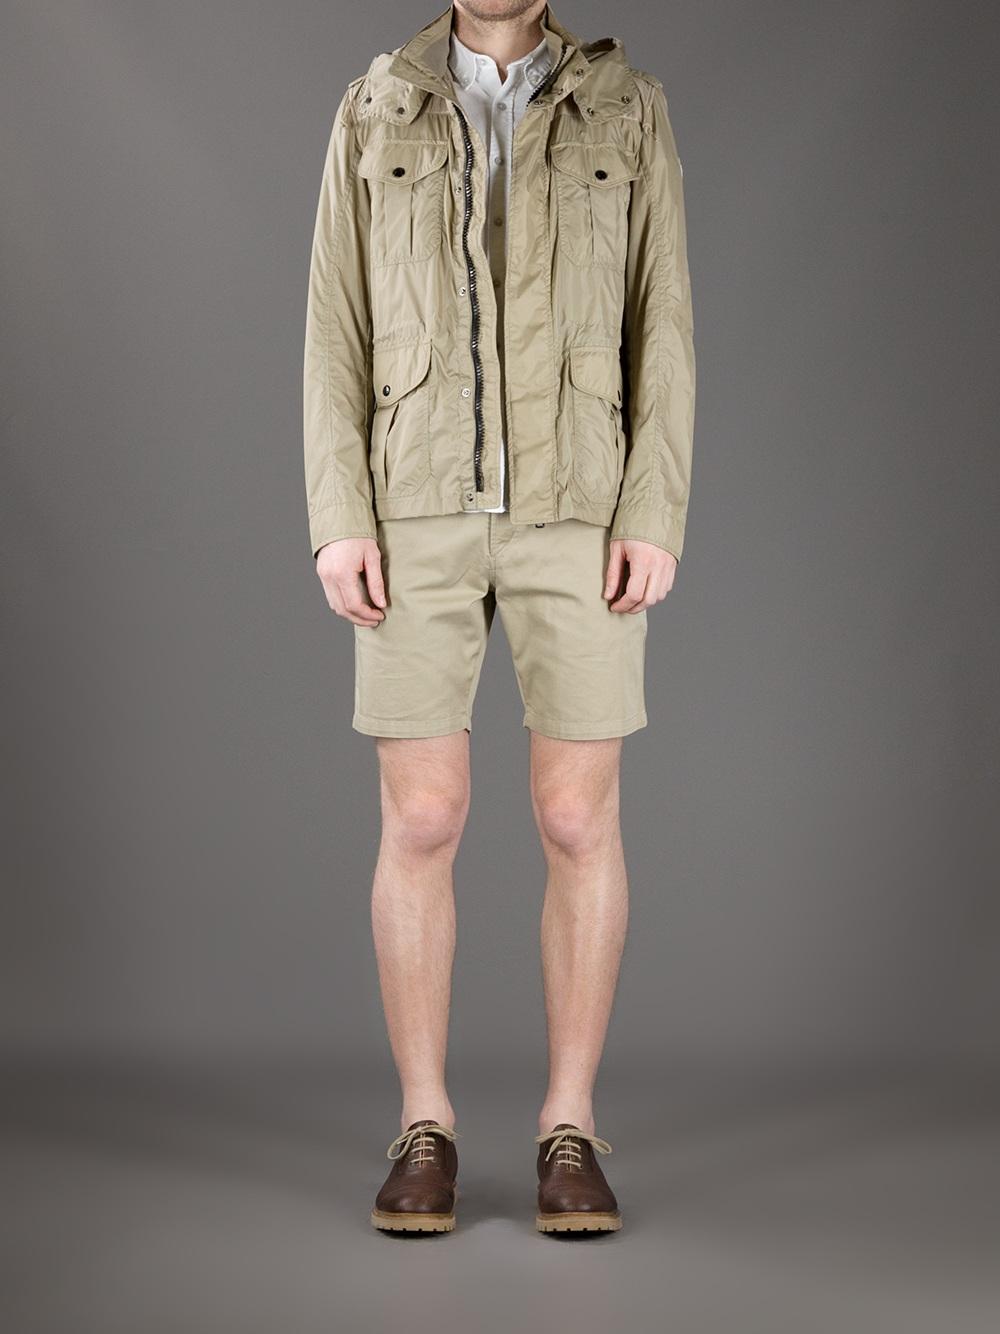 Moncler Peeters Jacket In Beige For Men Lyst